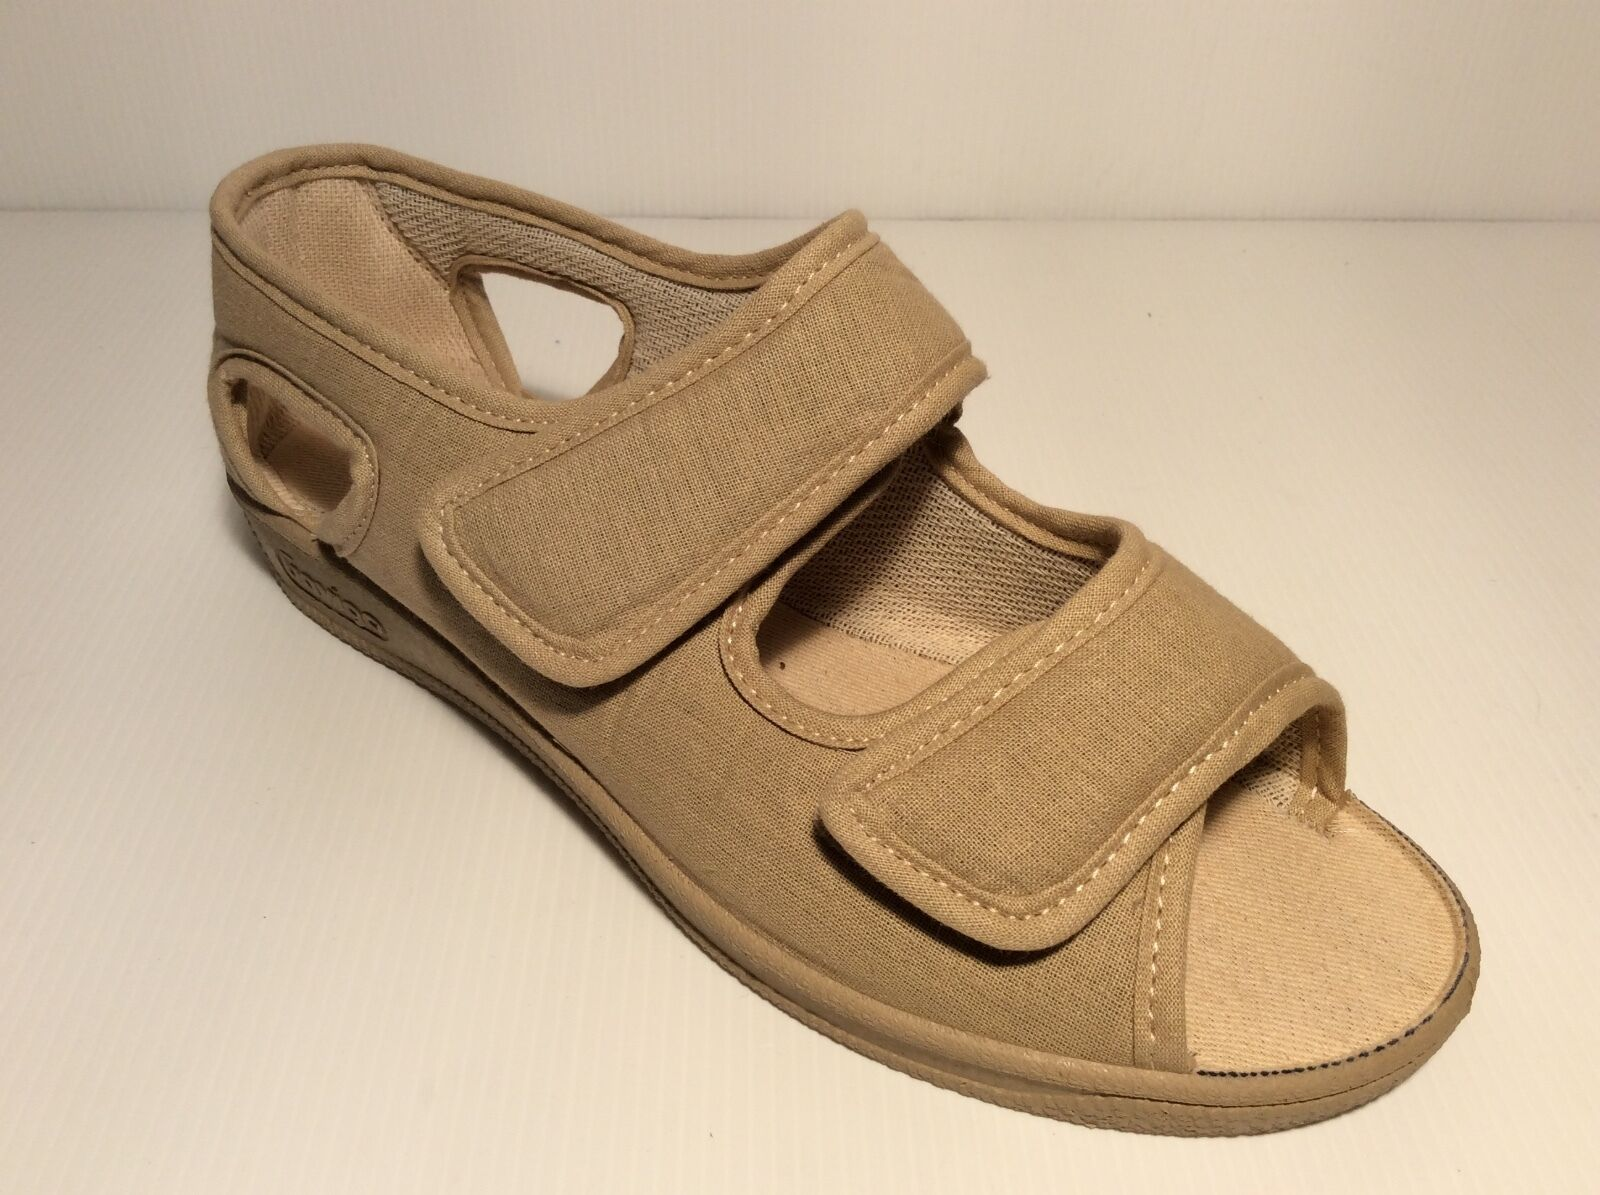 GAVIGA FALCO 180 pantofola sandalo DONNA tessuto gomma velcri comoda  col beige